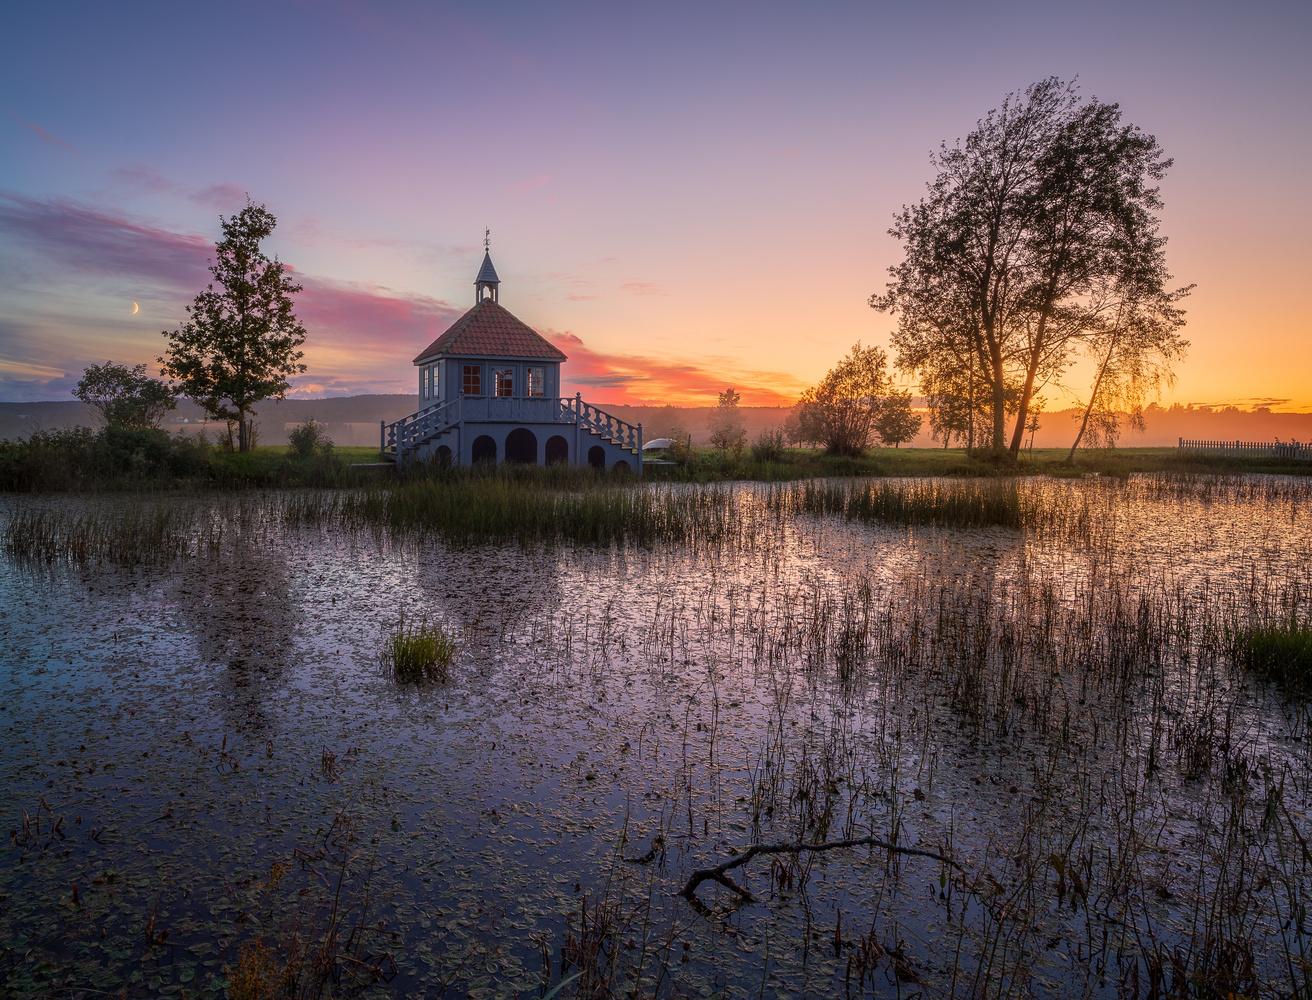 Spydeberg Prestegård by Mikkel Nordbæk